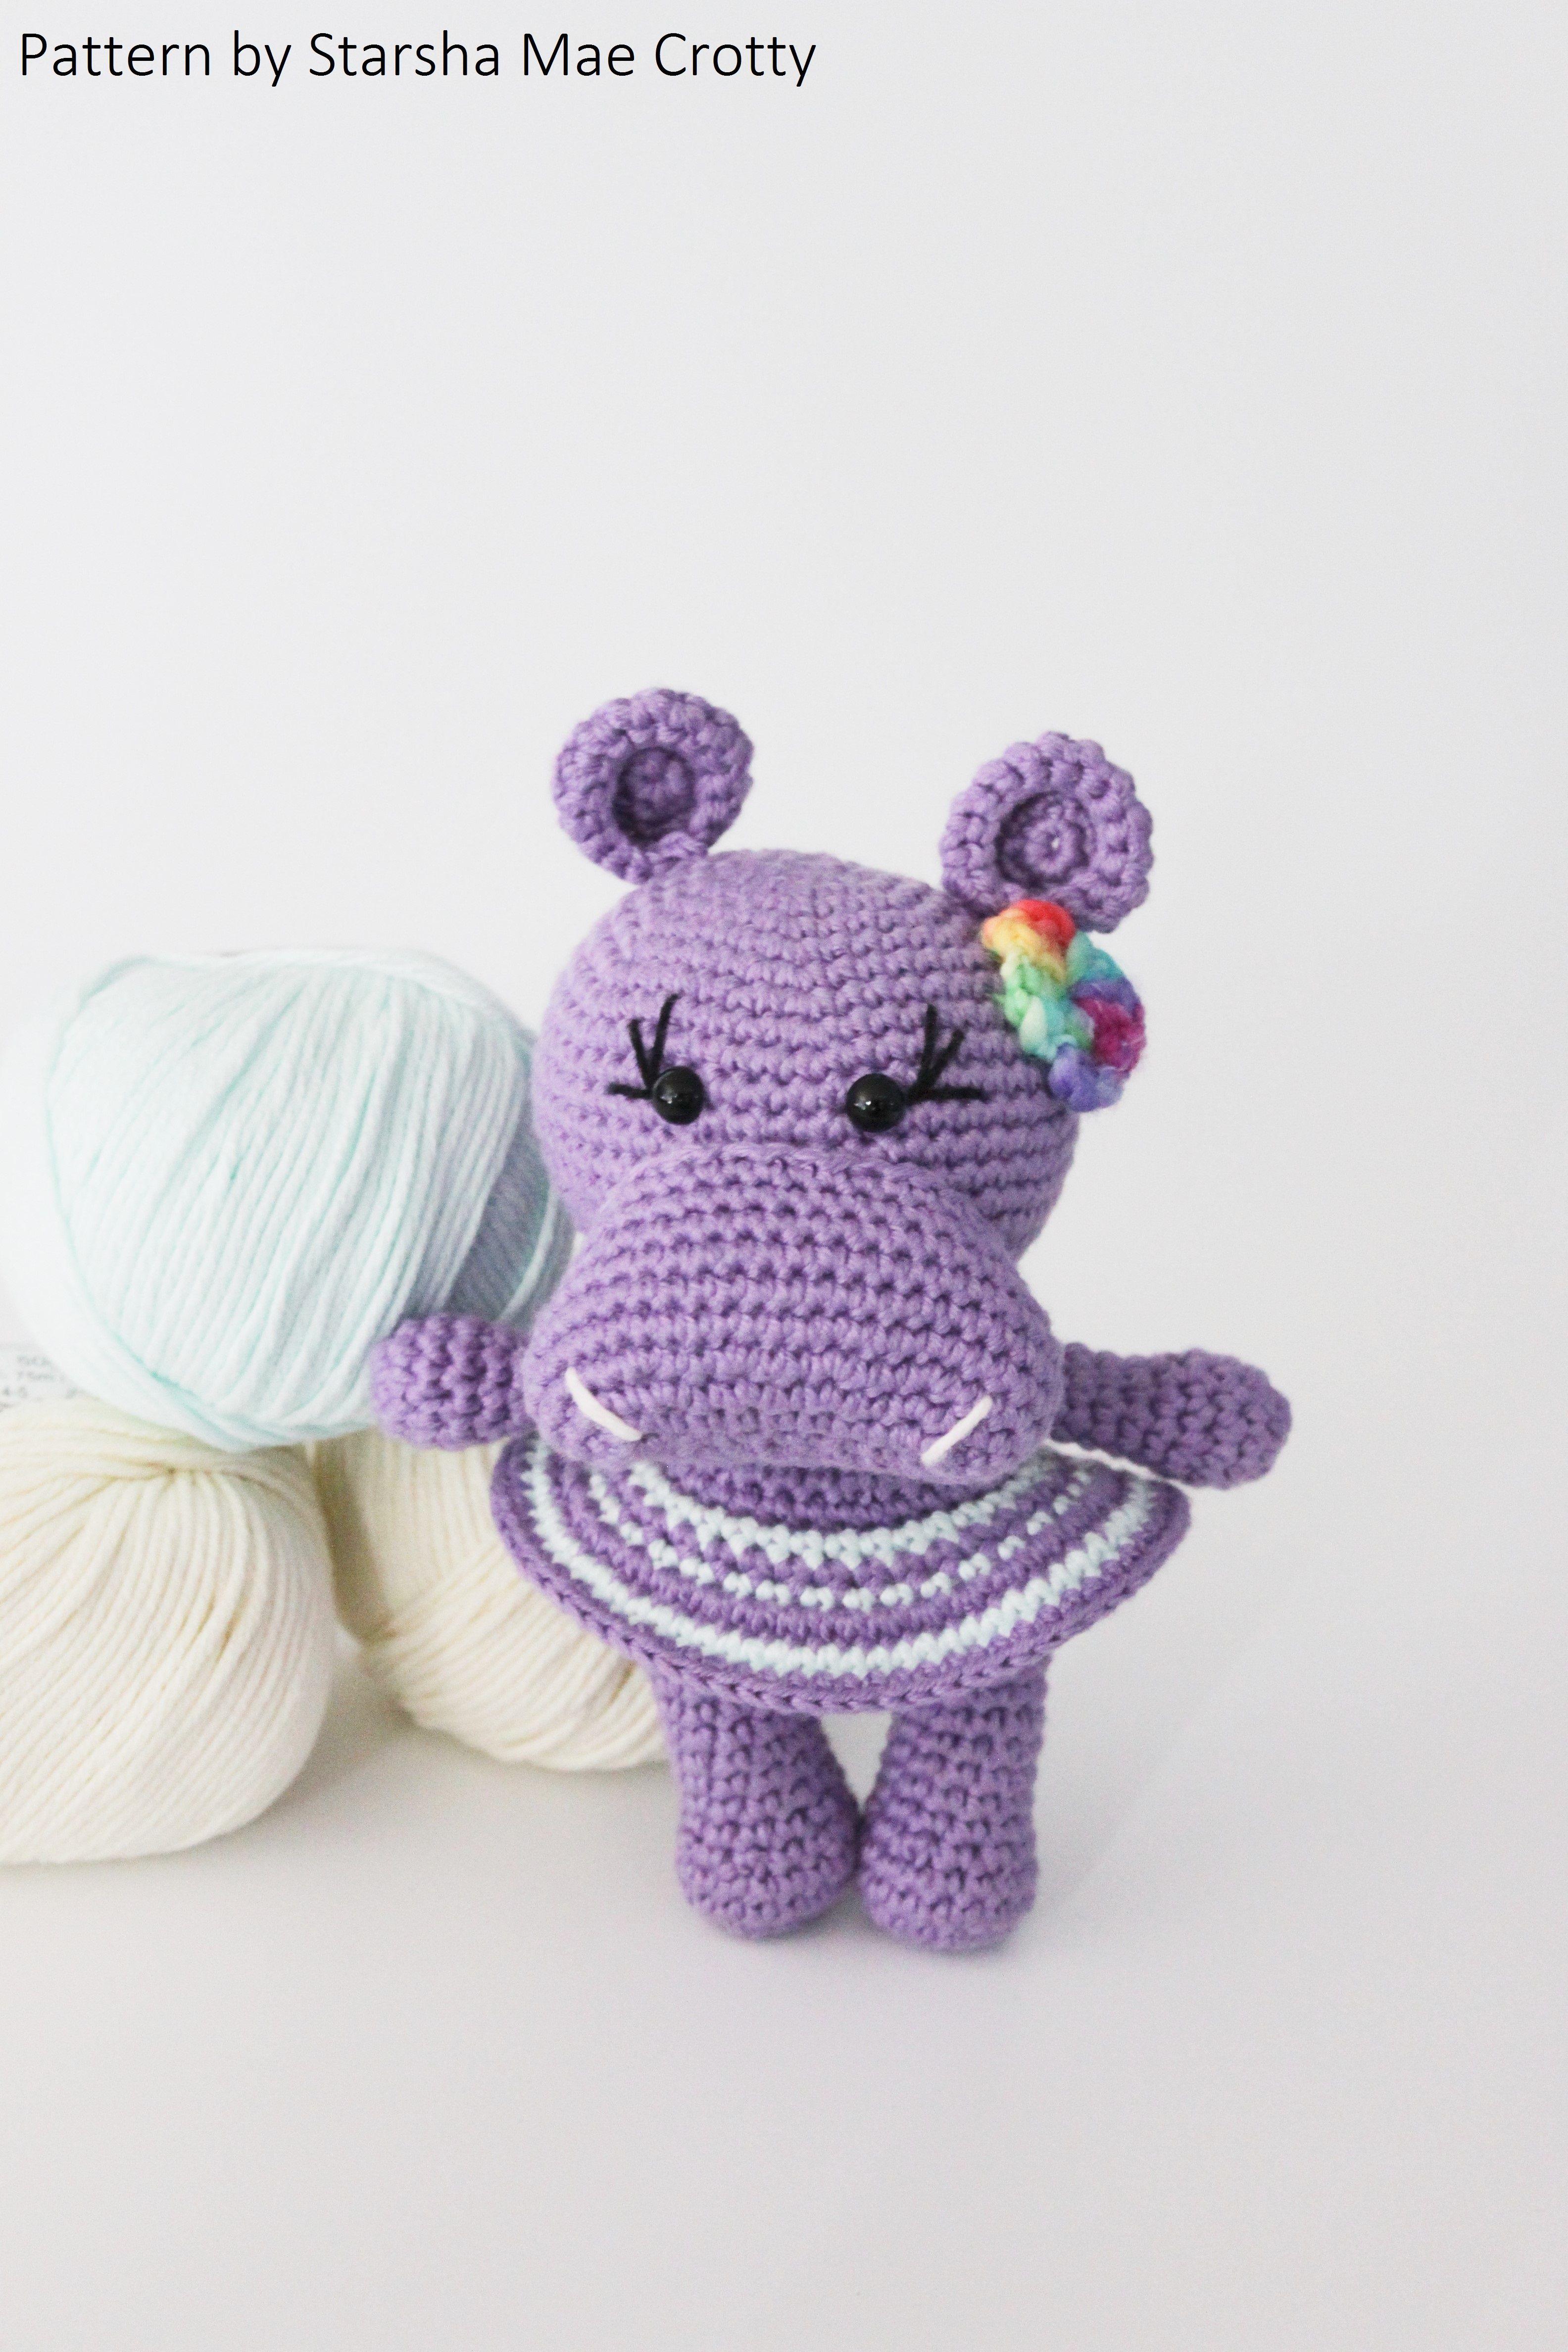 Crochet Hippo Pattern Interesting Ideas